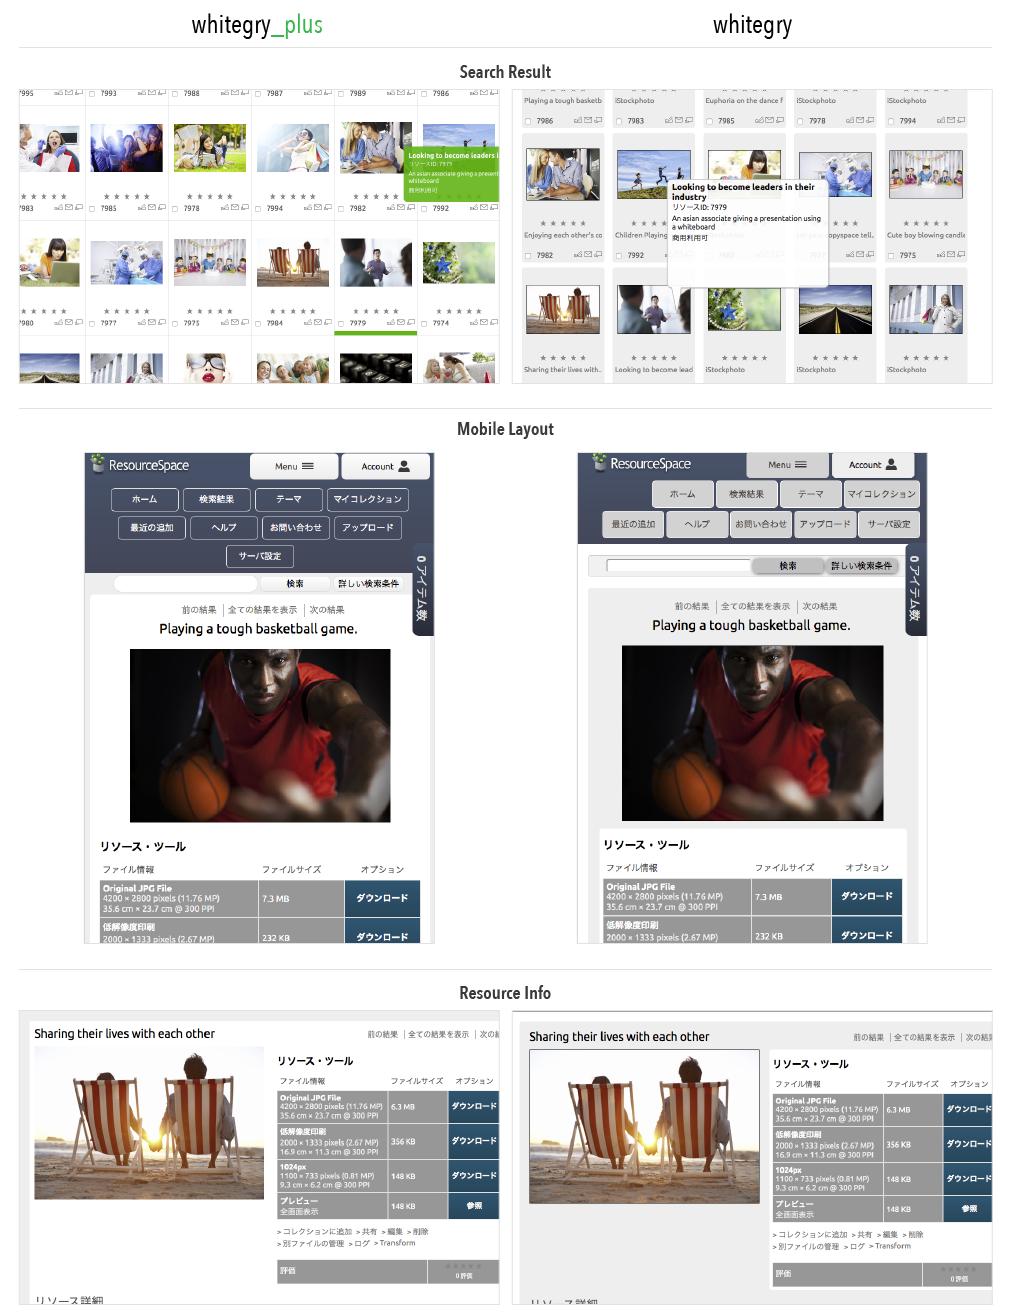 whitegryとwhitegry_plusのデザインを比較した画像が表示されている。